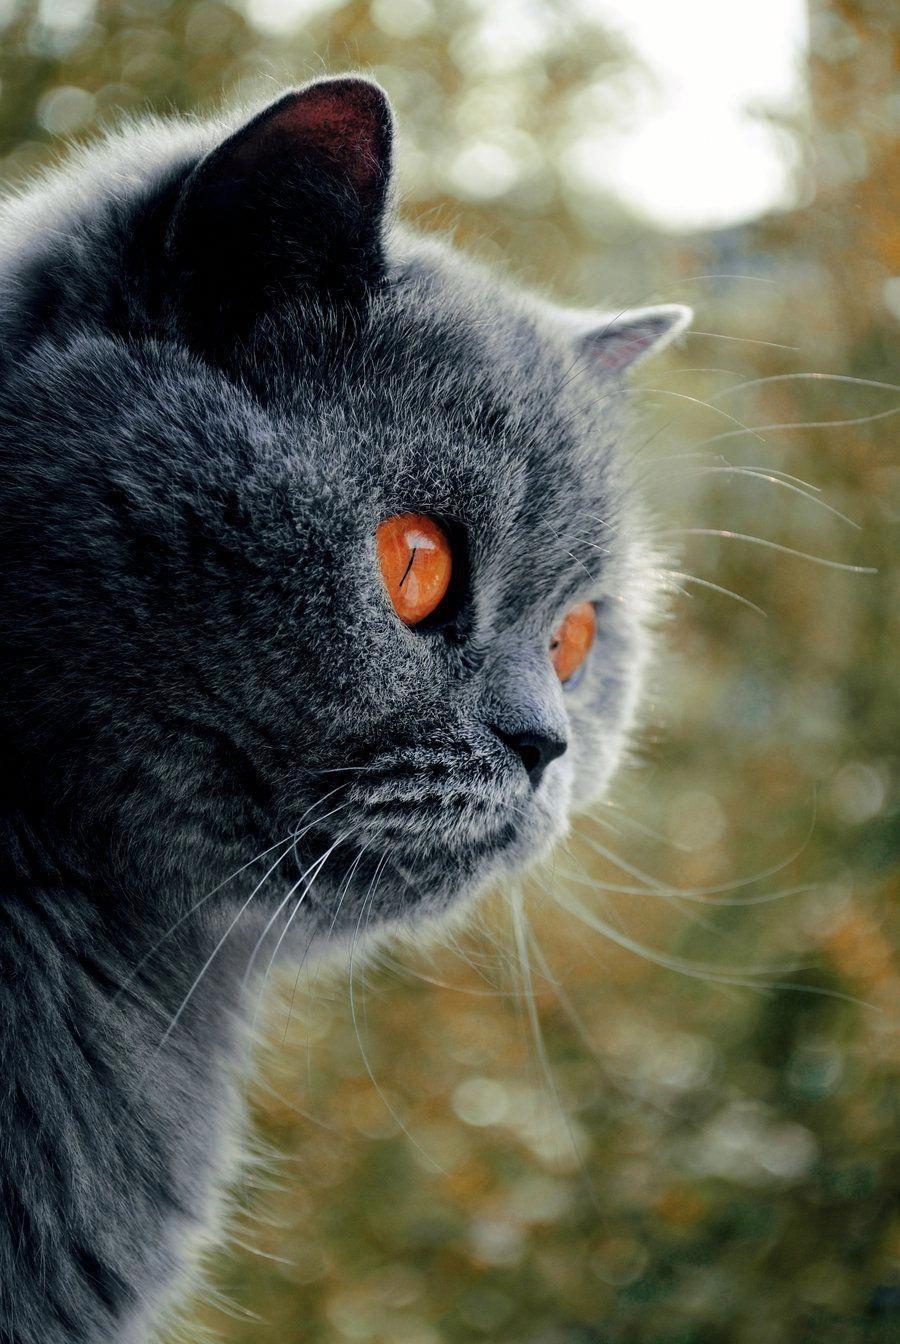 Blue Cat Autumn By Sepraven On Deviantart Greycat Pretty Cats Beautiful Cats Cats